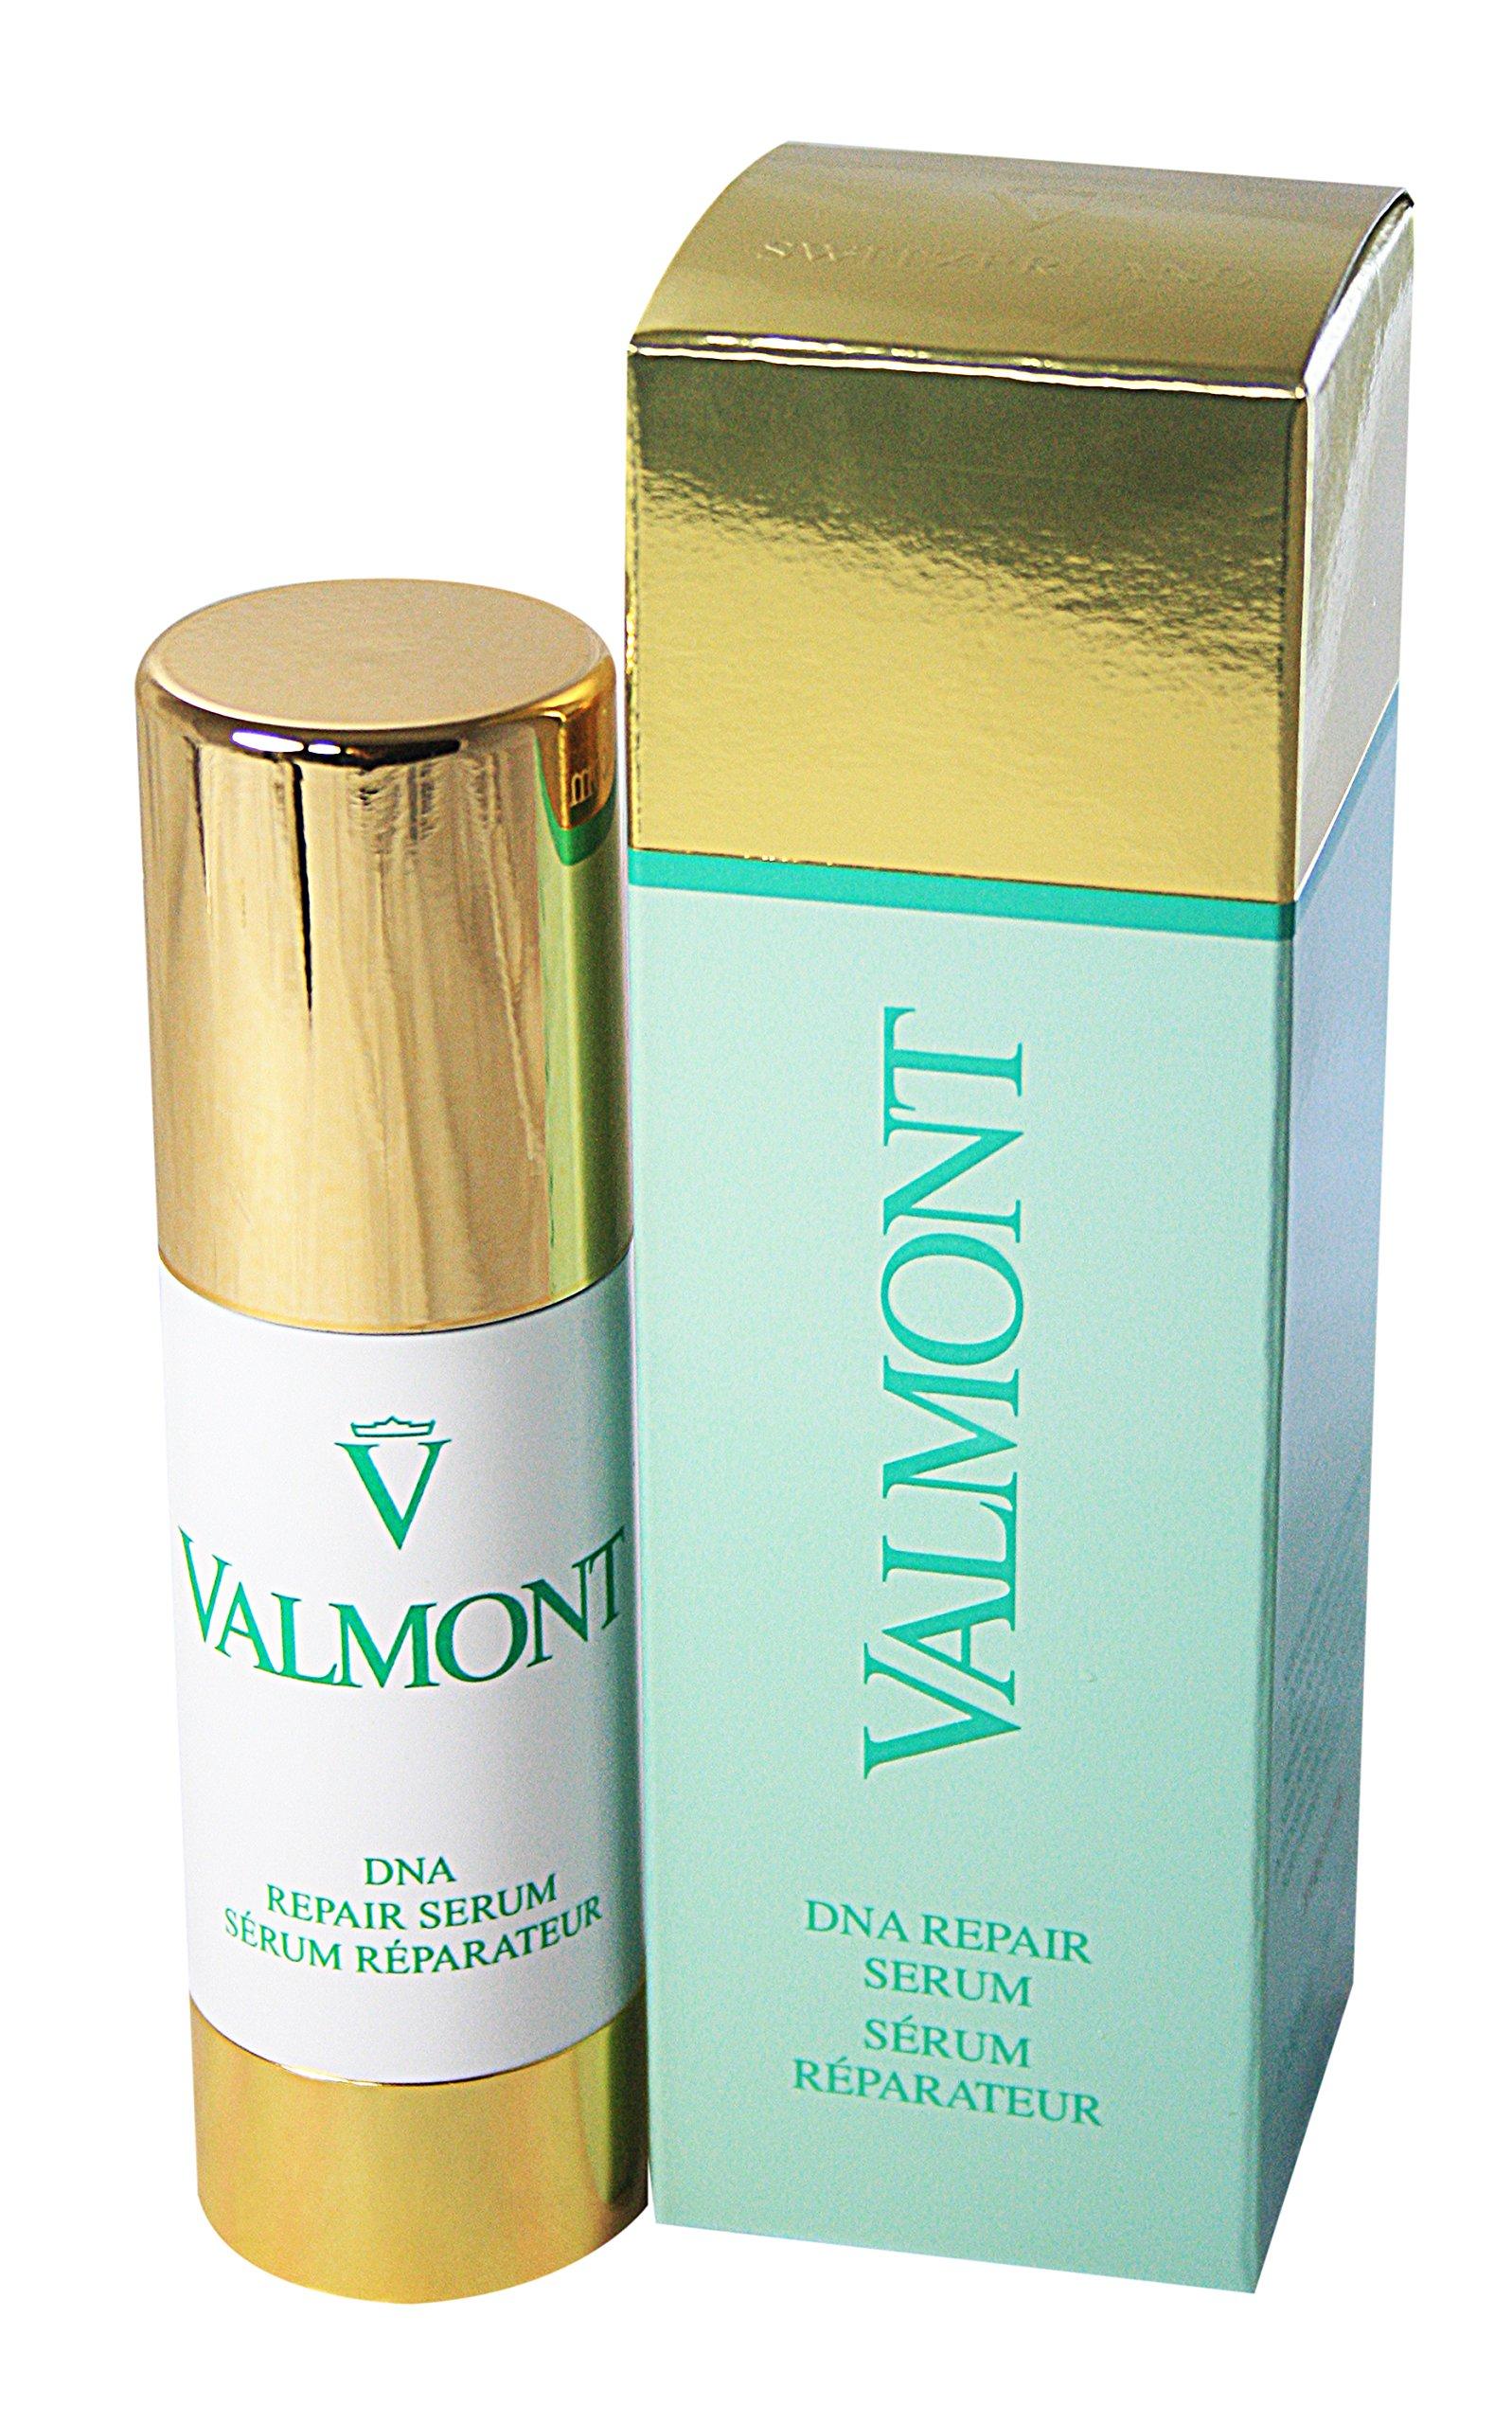 Valmont DNA Repair Serum for Unisex, 0.1 Pound